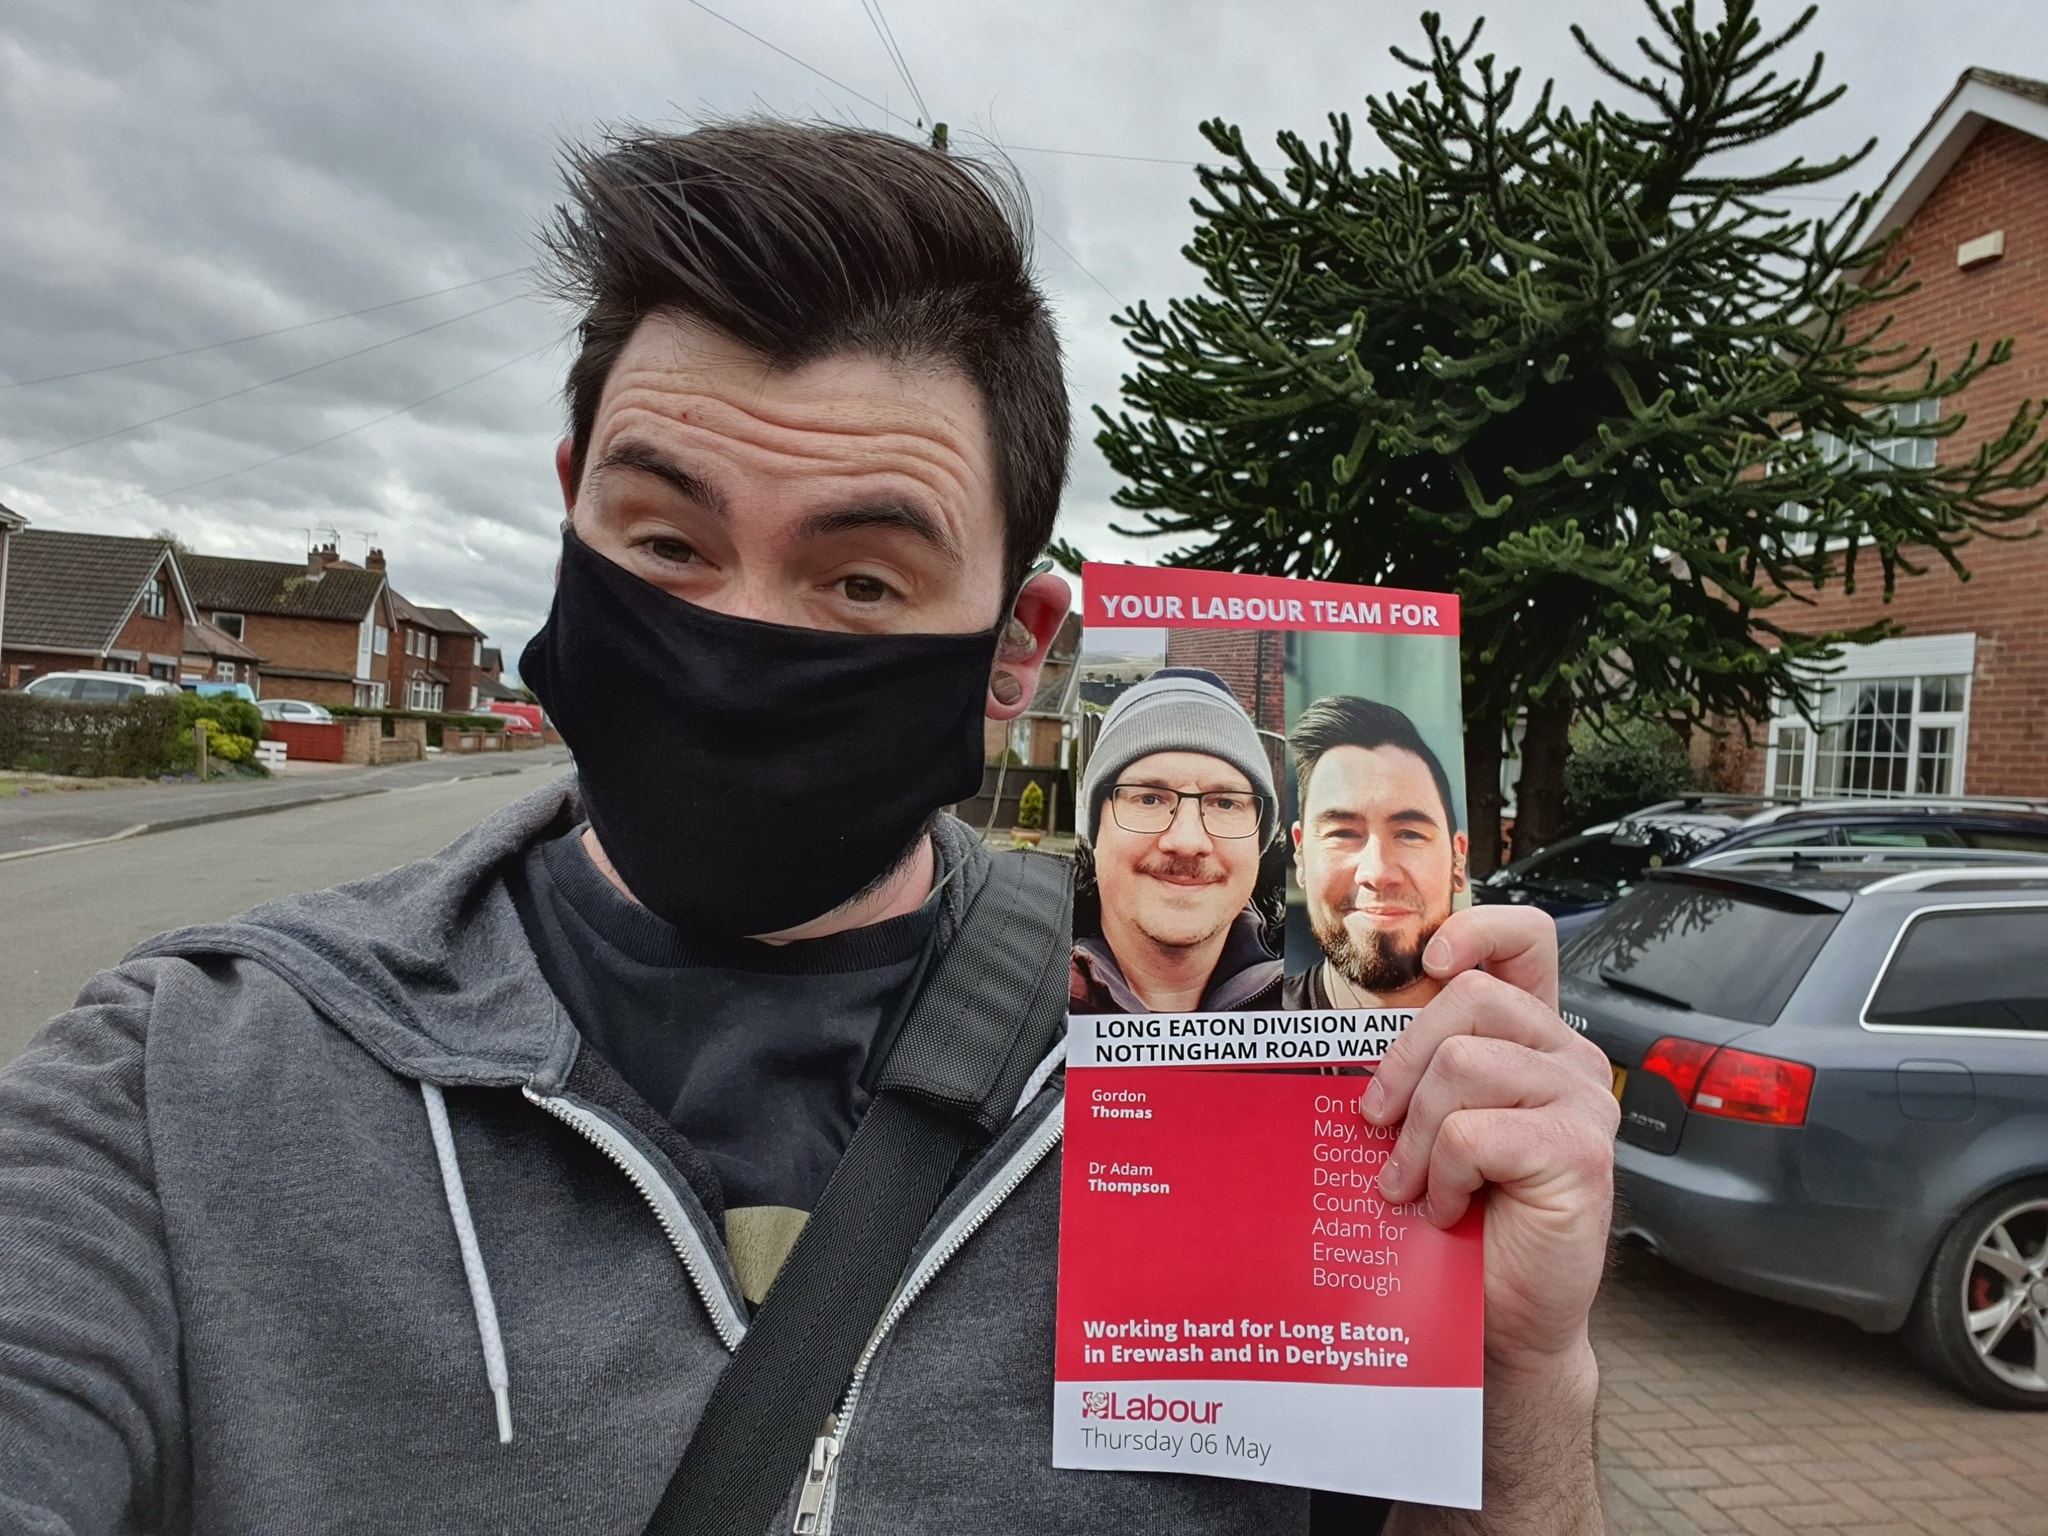 Adam leafleting in Long Eaton